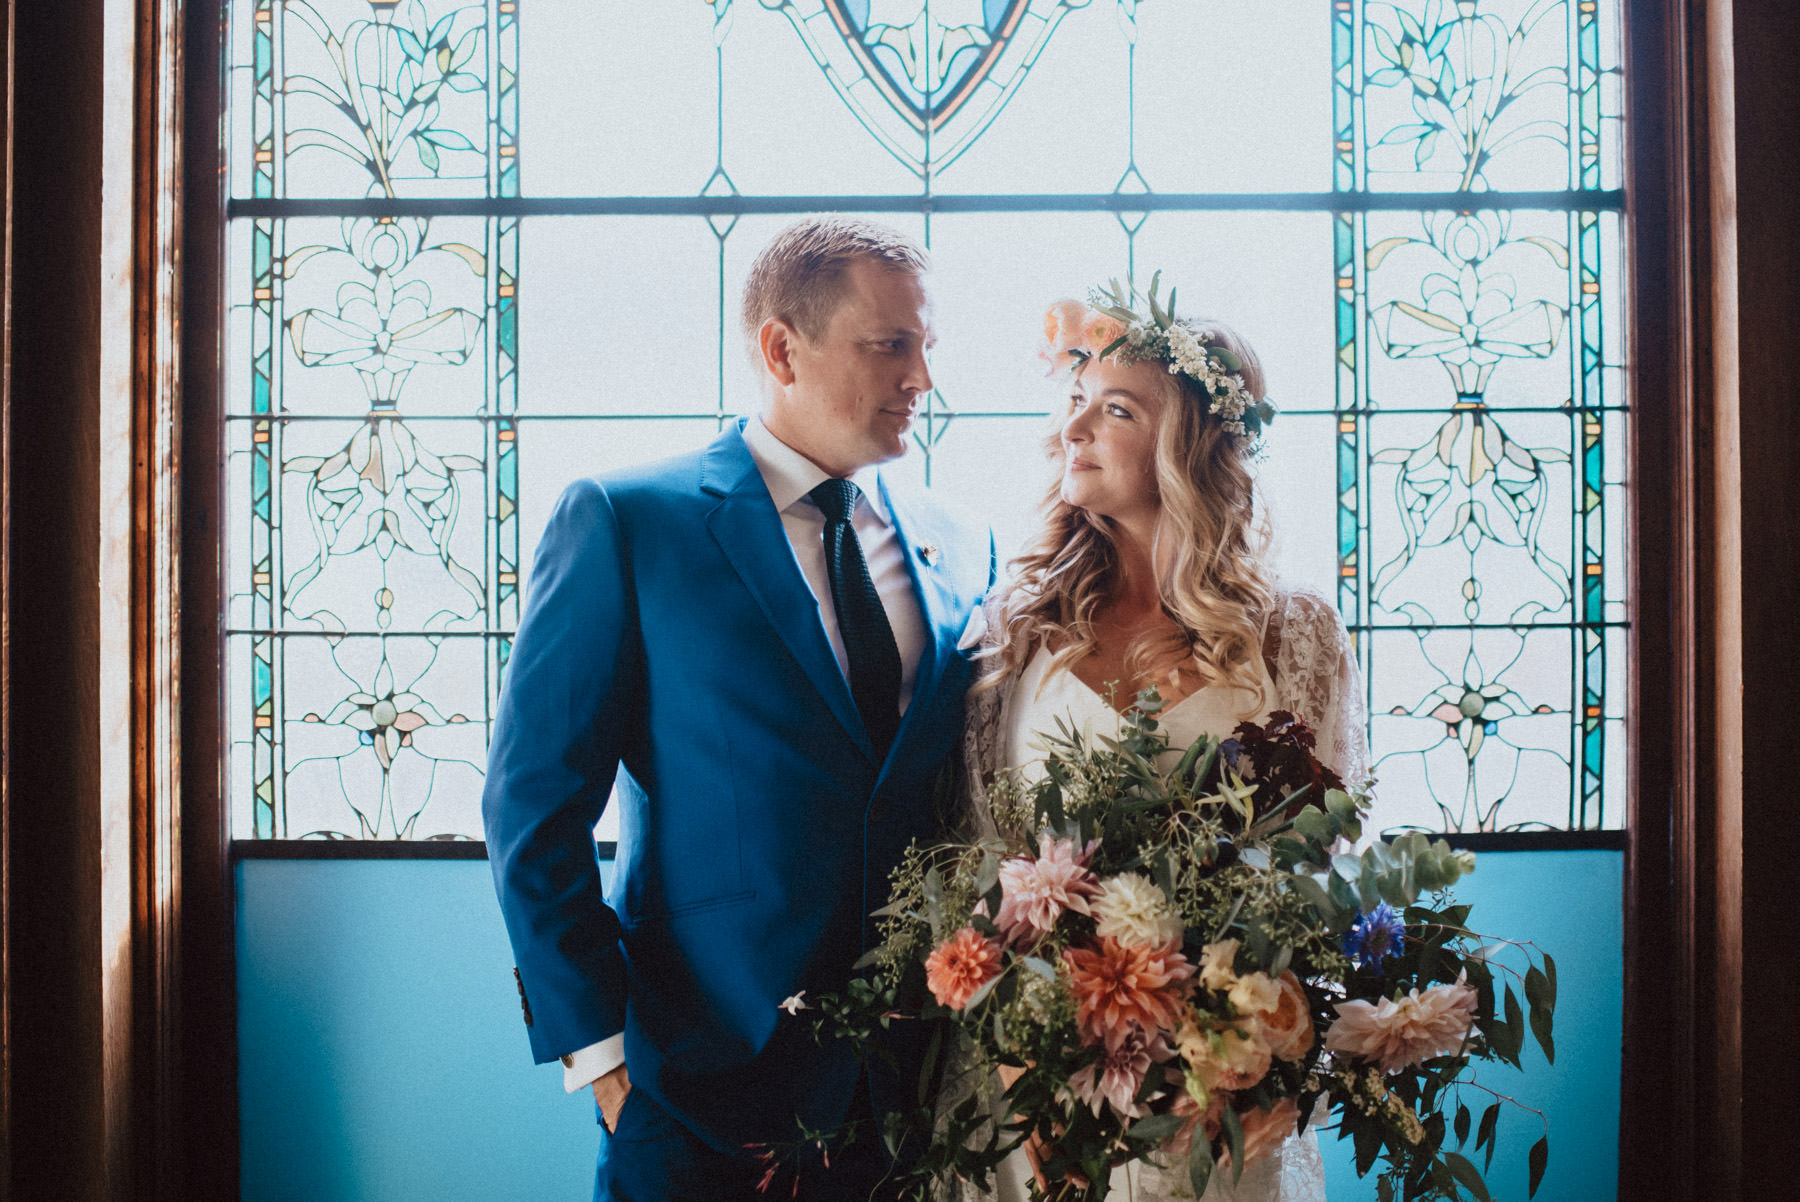 245-la-cherie-philly-wedding-3.jpg